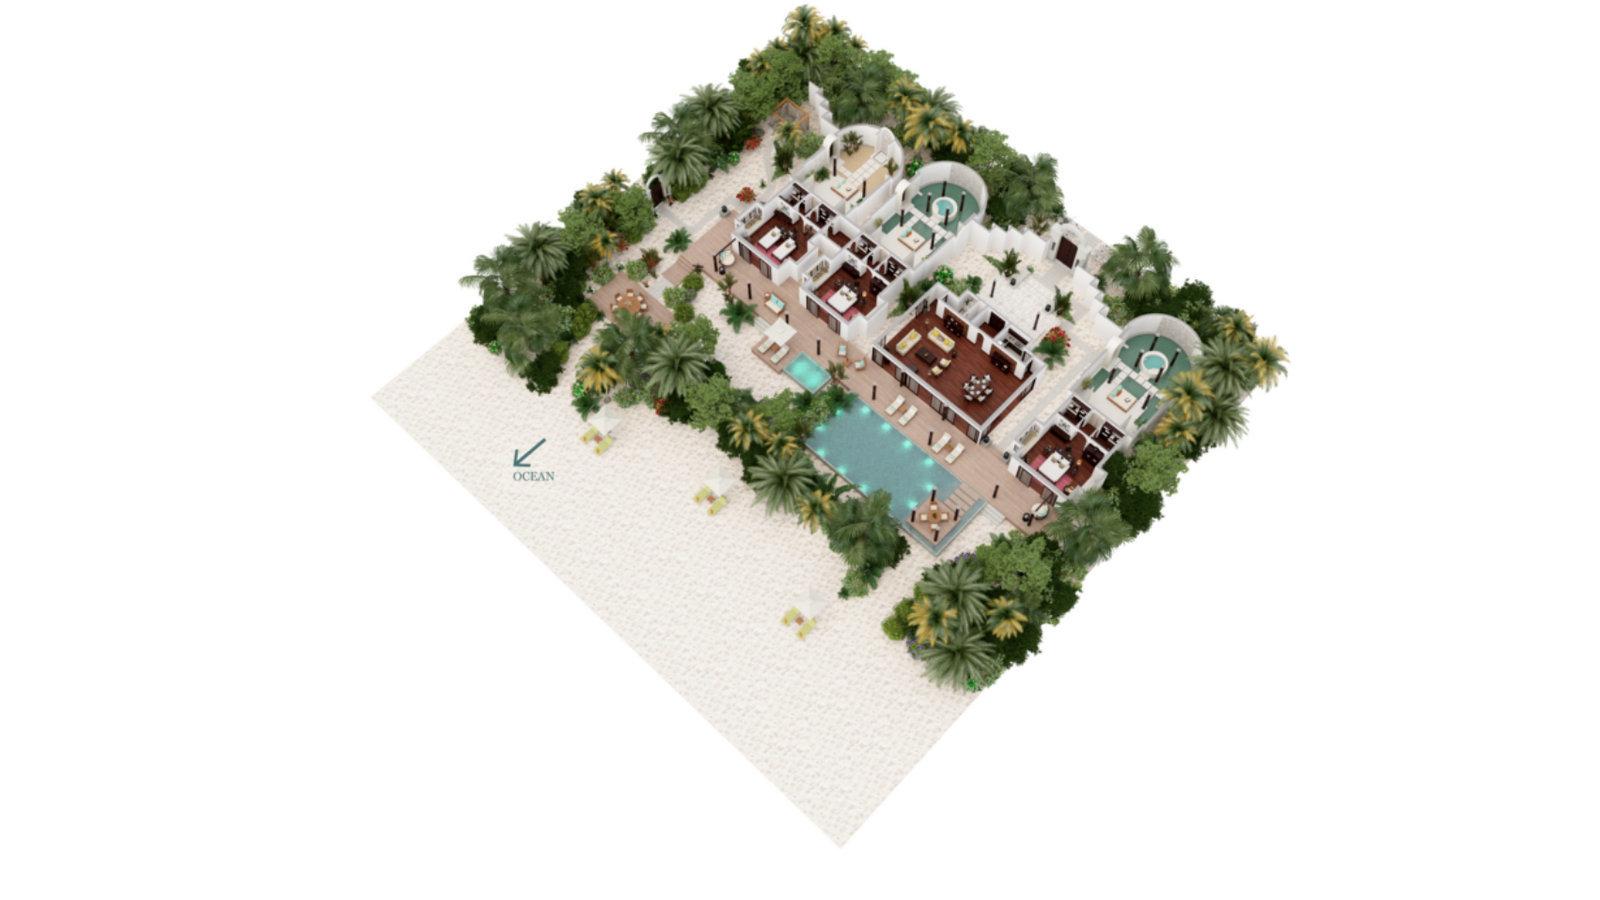 Мальдивы, отель Anantara Kihavah Maldives Villas, план-схема номера Three-Bedroom Presidential Beach Residence